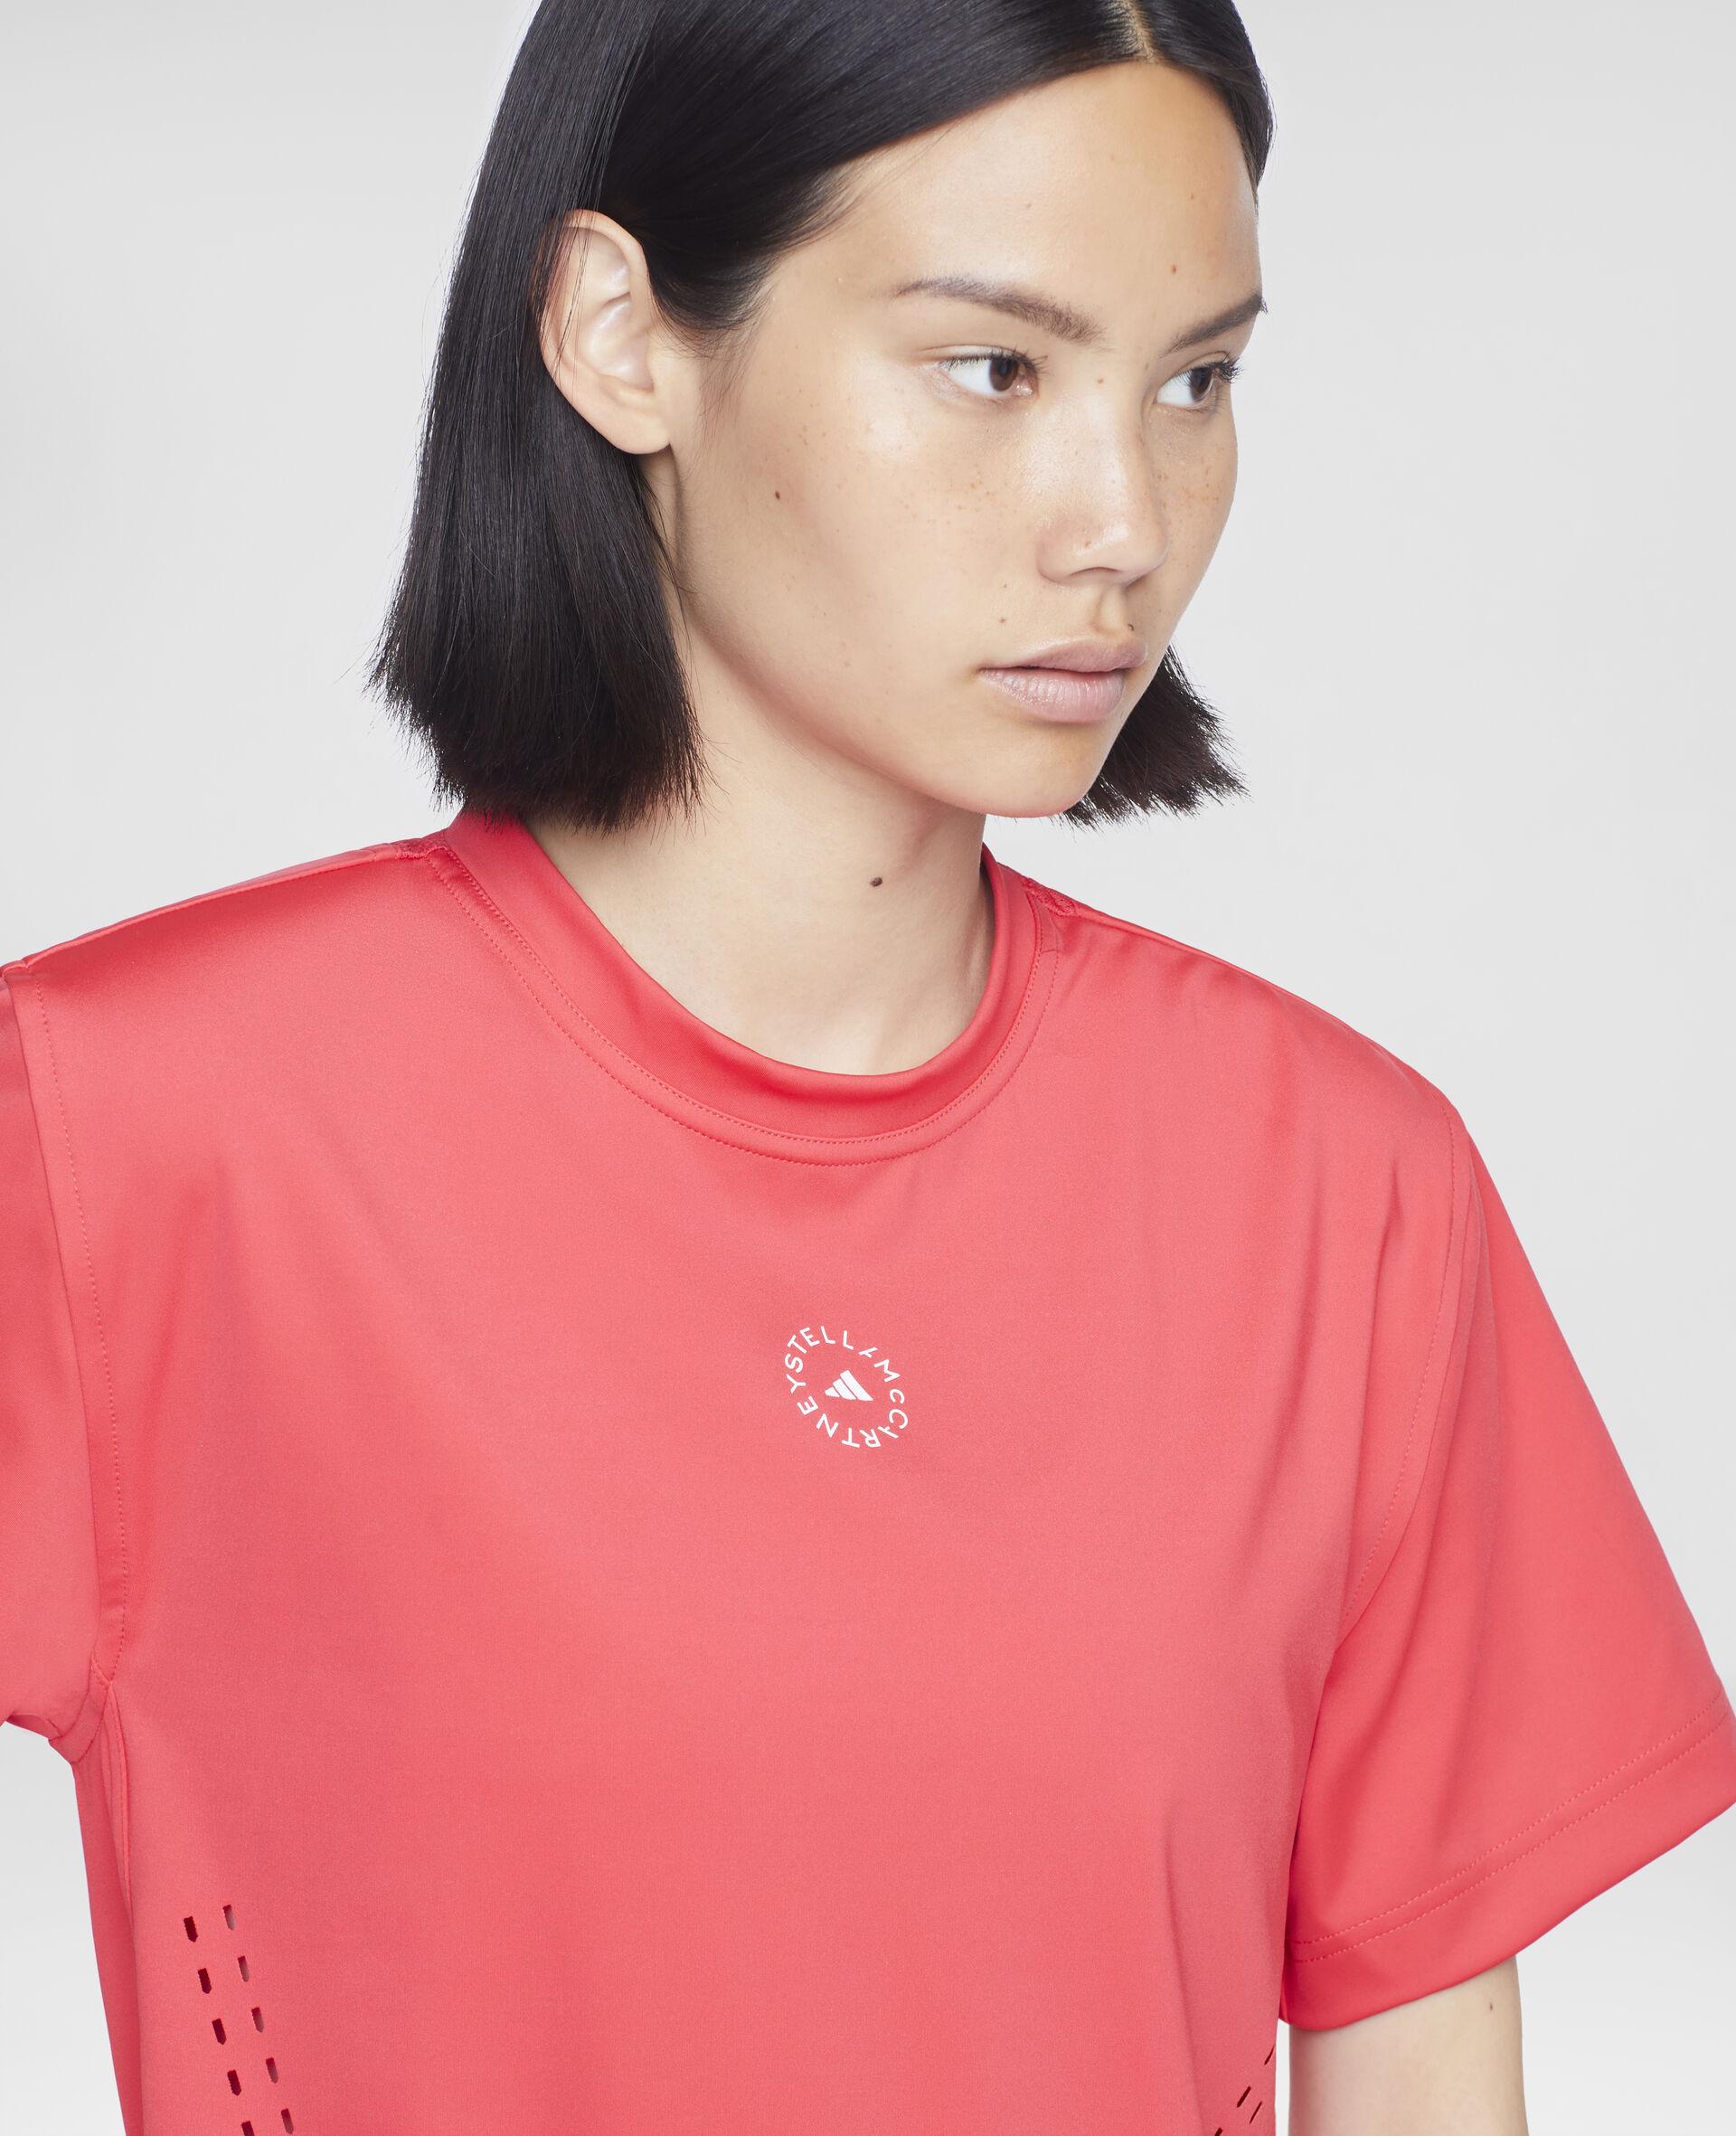 Rosa Trainings-T-Shirt-Rose-large image number 3